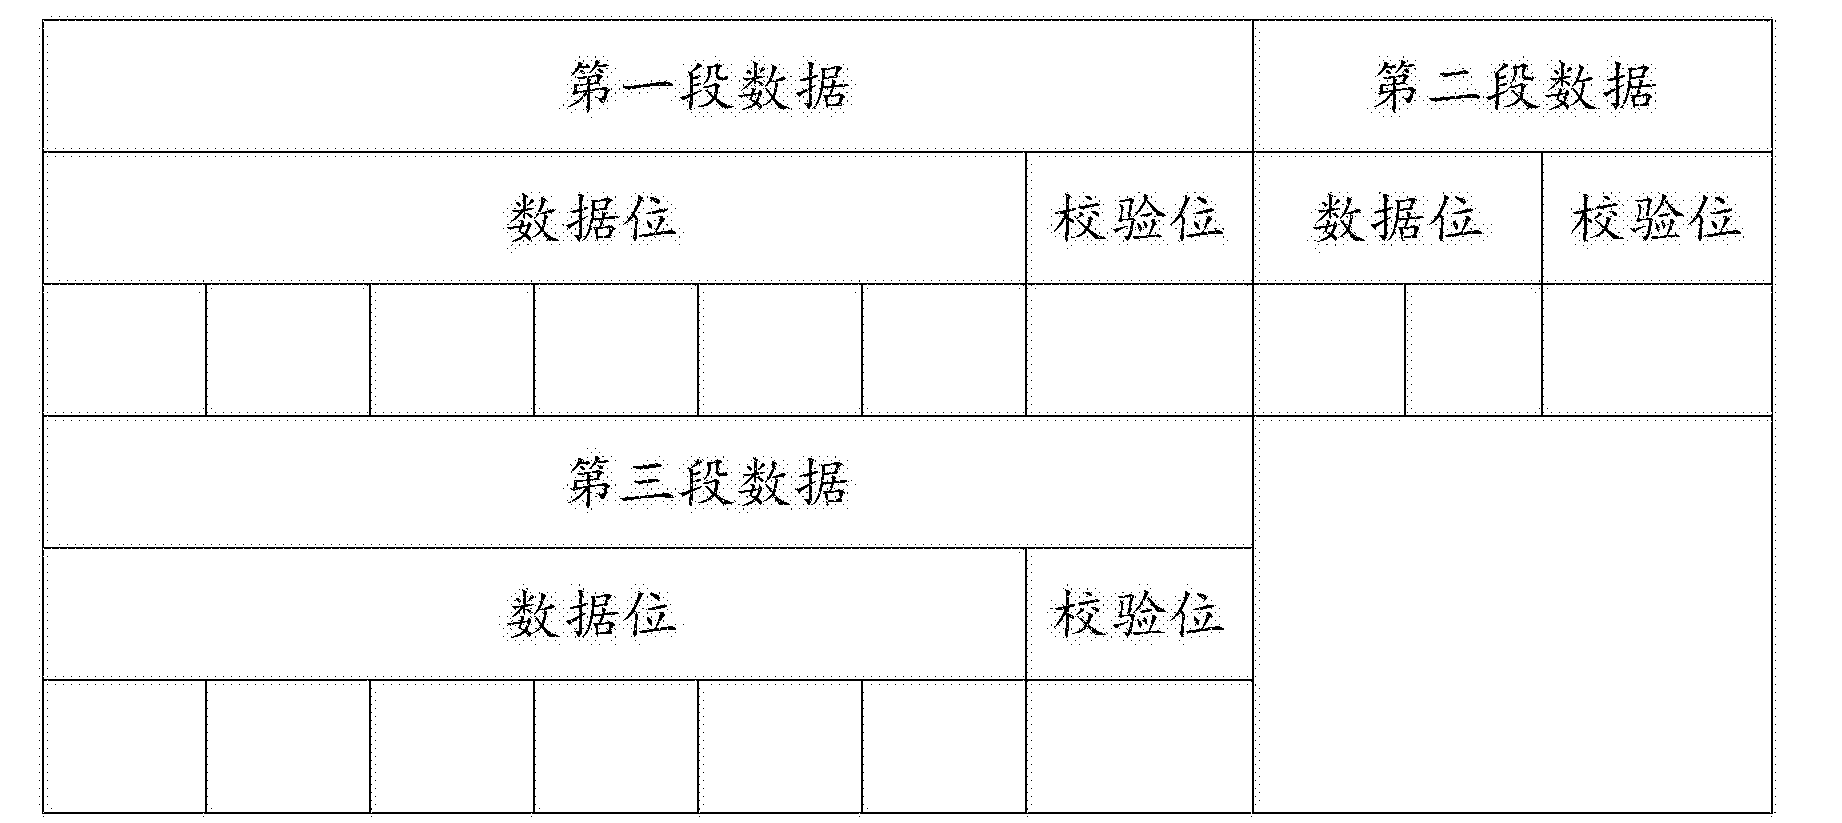 Figure CN108153229AD00052